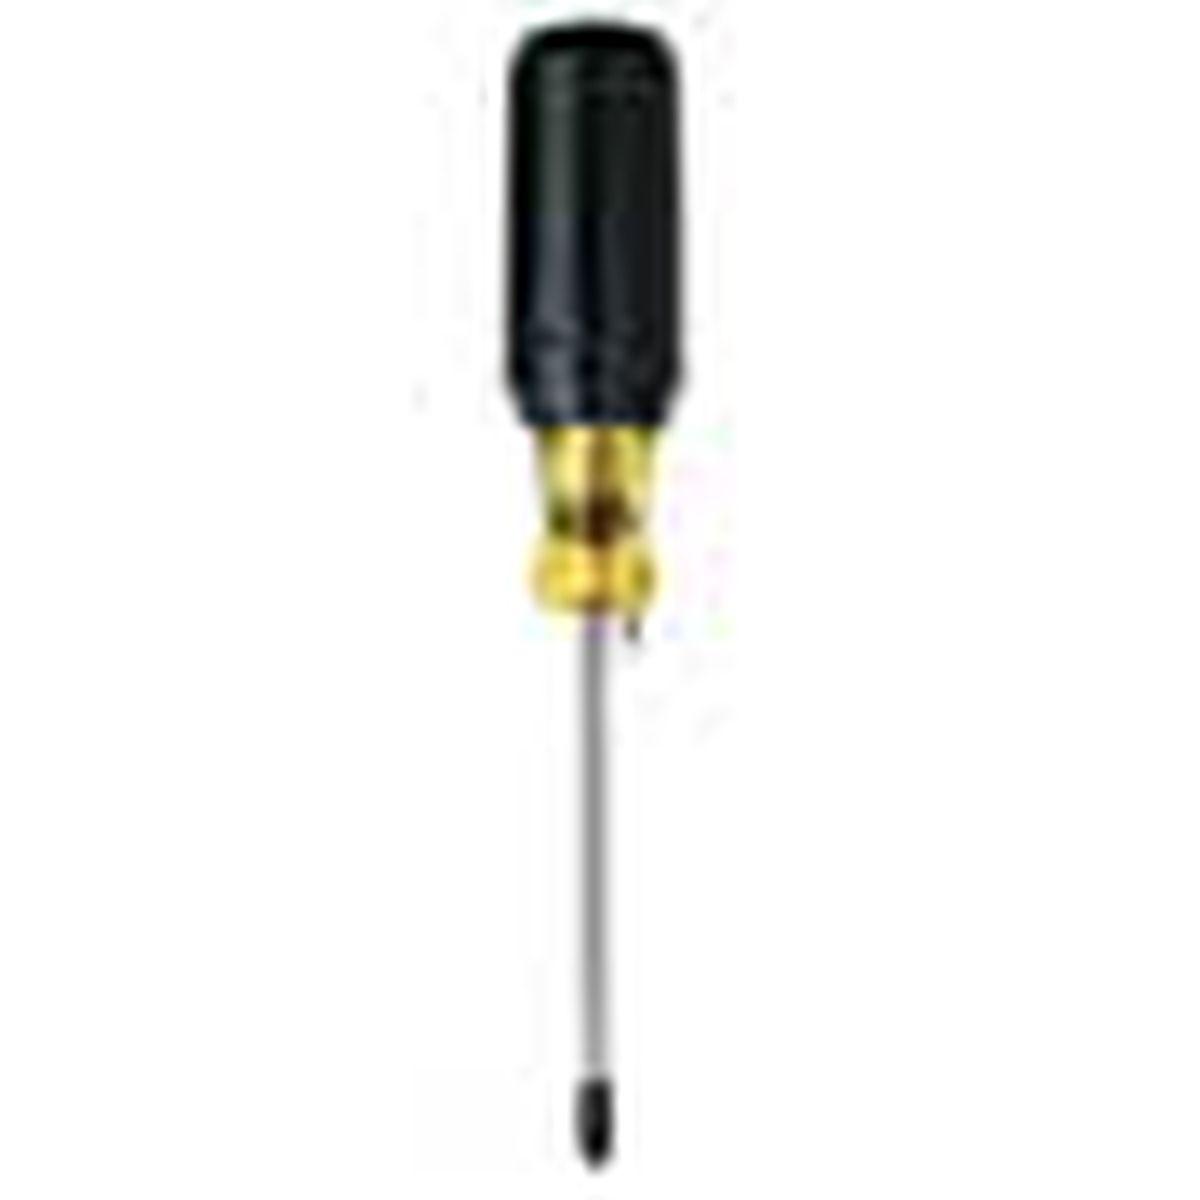 Phillips screwdriver